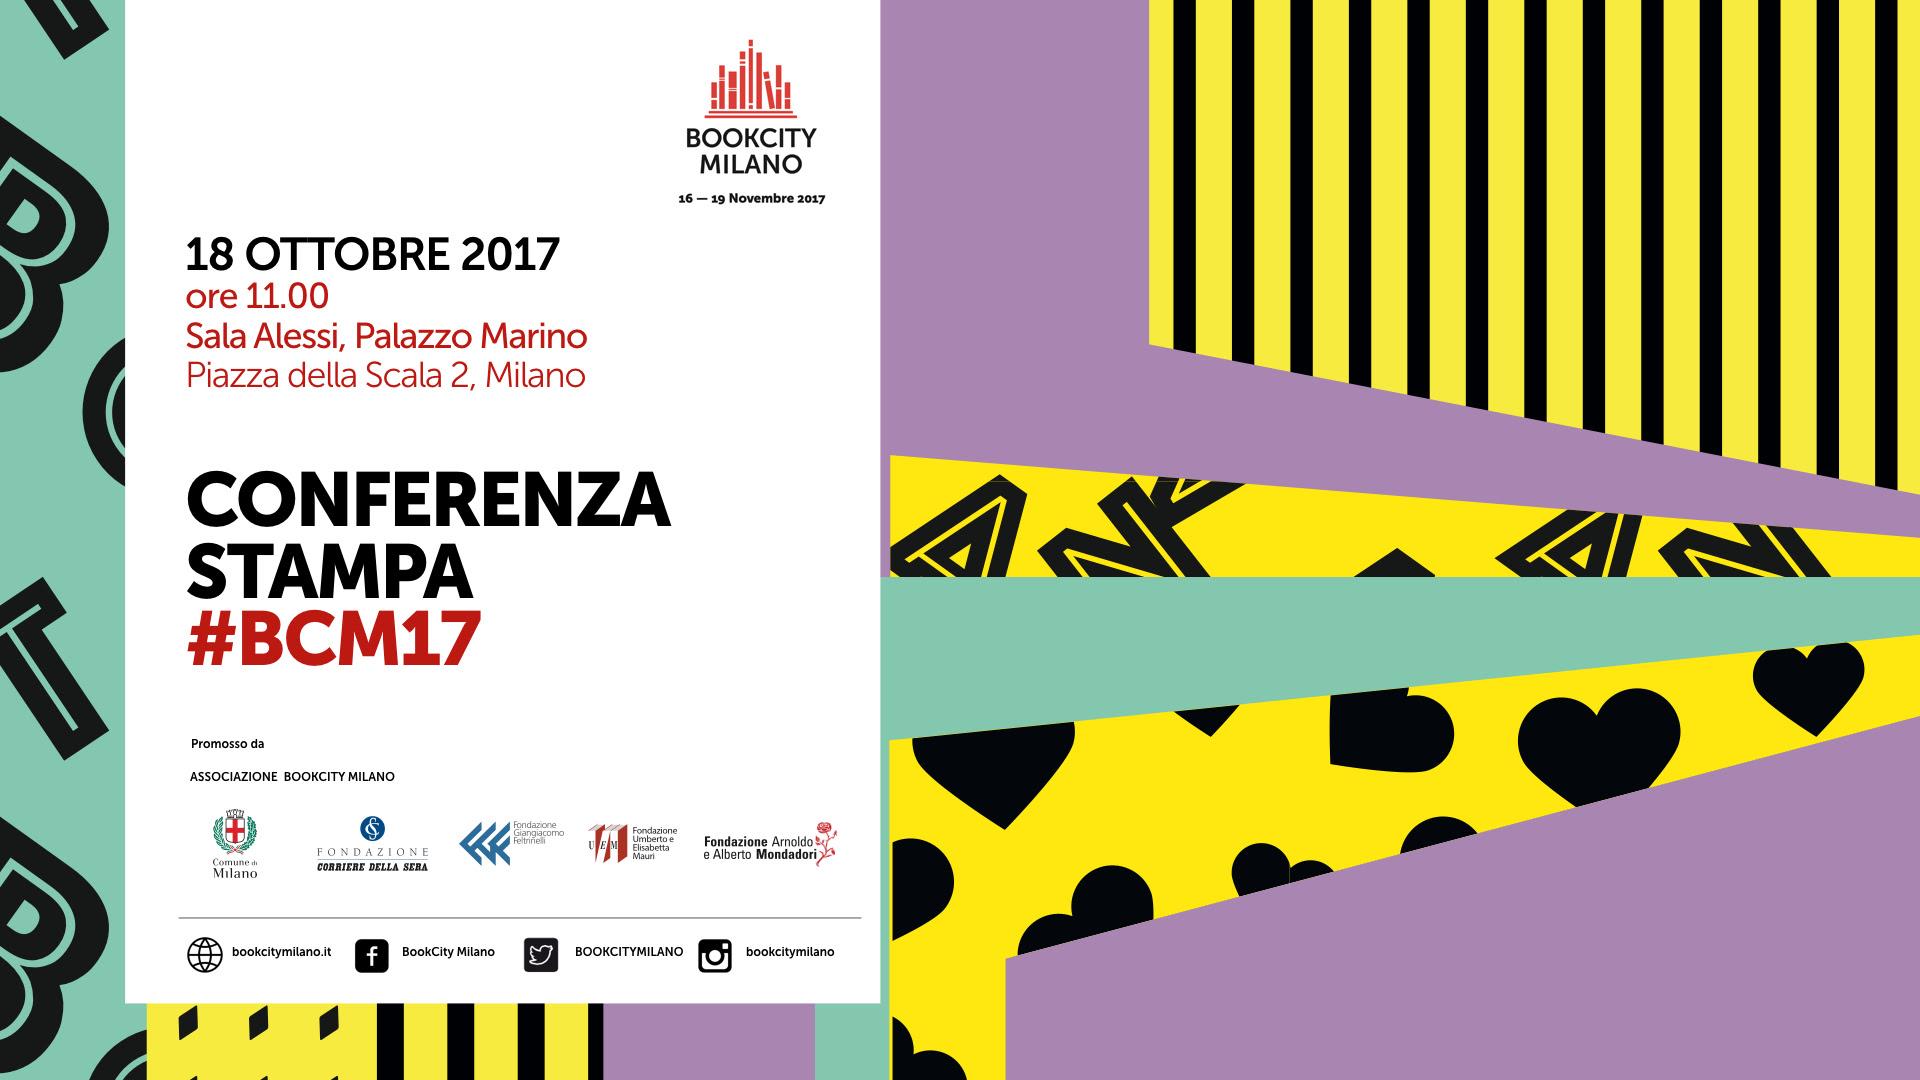 conferenza stampa bookcity milano 2017.jpg